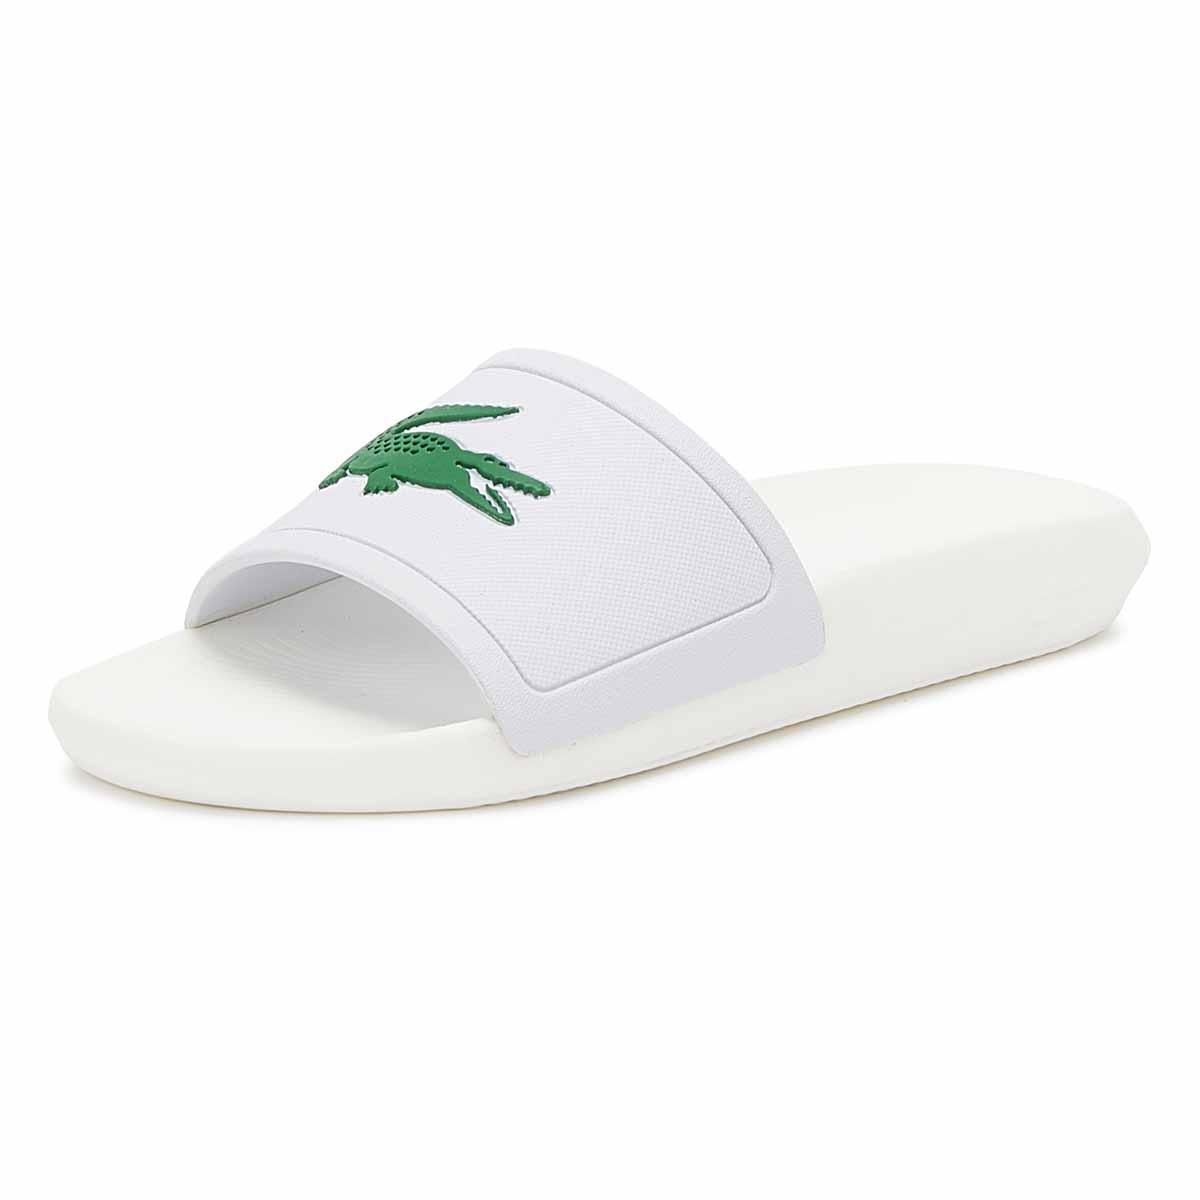 d0a4a538936f Lacoste - Croco 119 1 Mens White   Green Slides for Men - Lyst. View  fullscreen